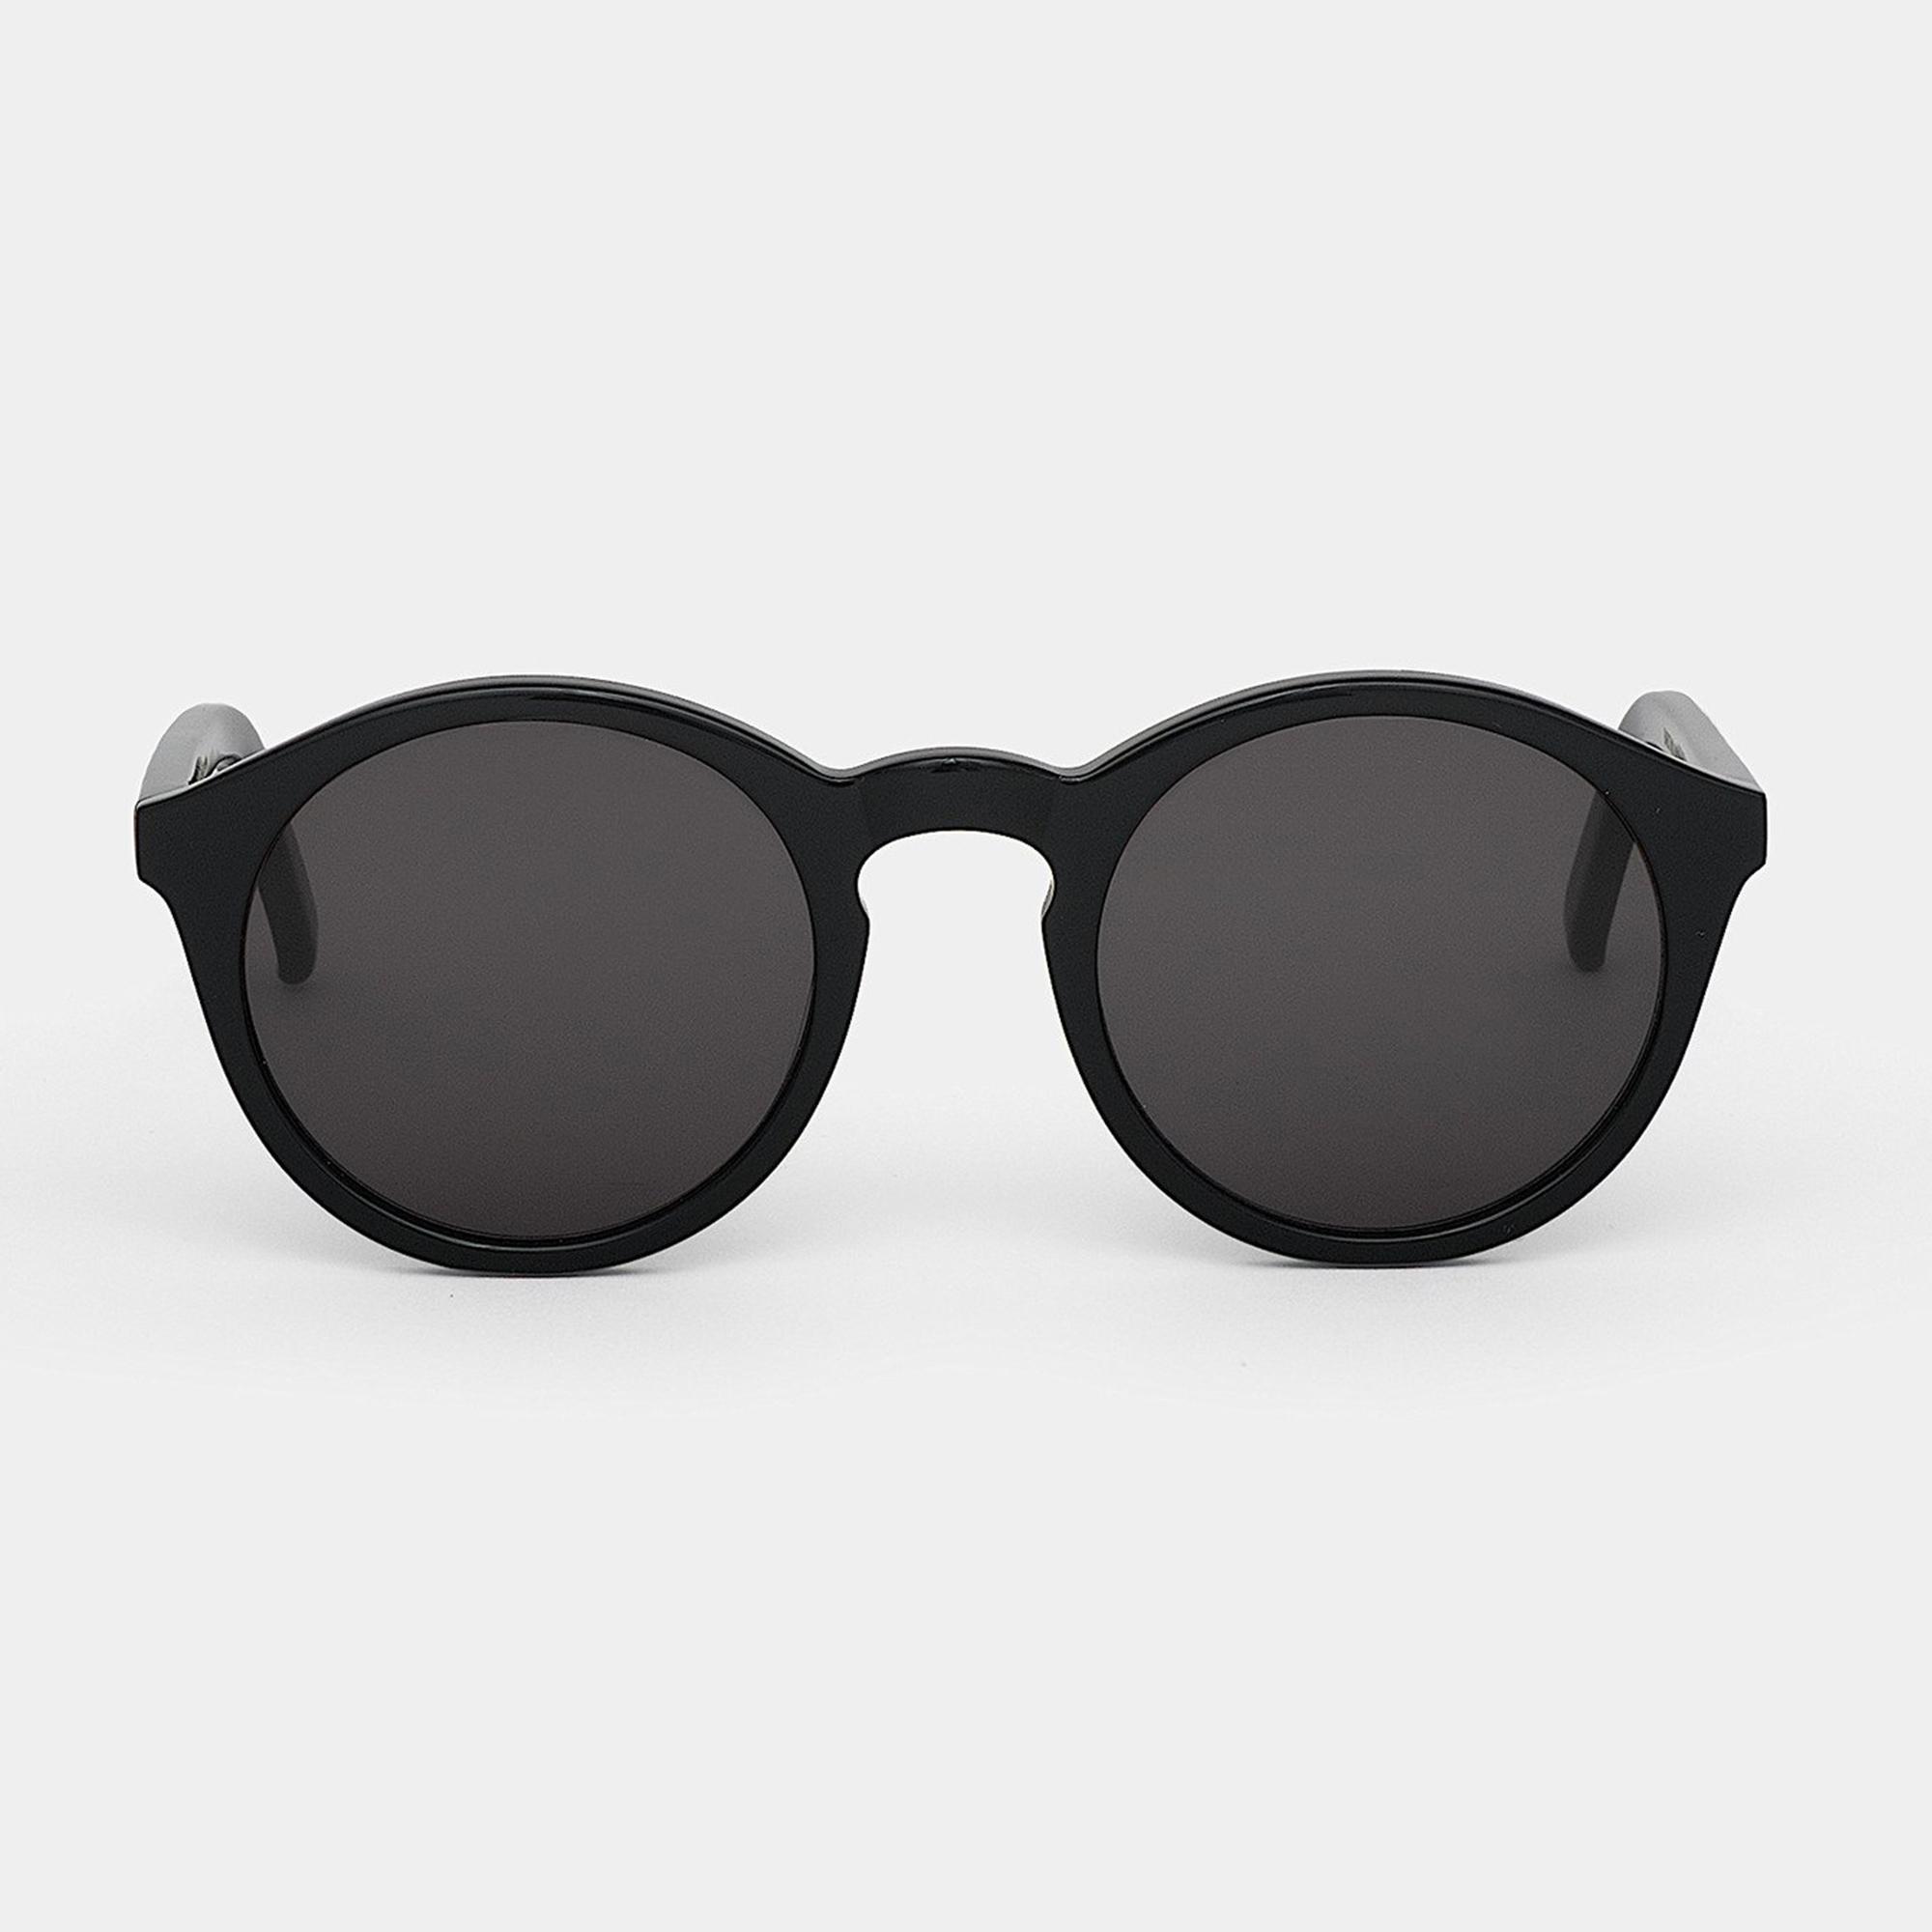 7e7eb379cd Lyst - Monokel Eyewear Barstow Sunglasses in Black for Men - Save 27%